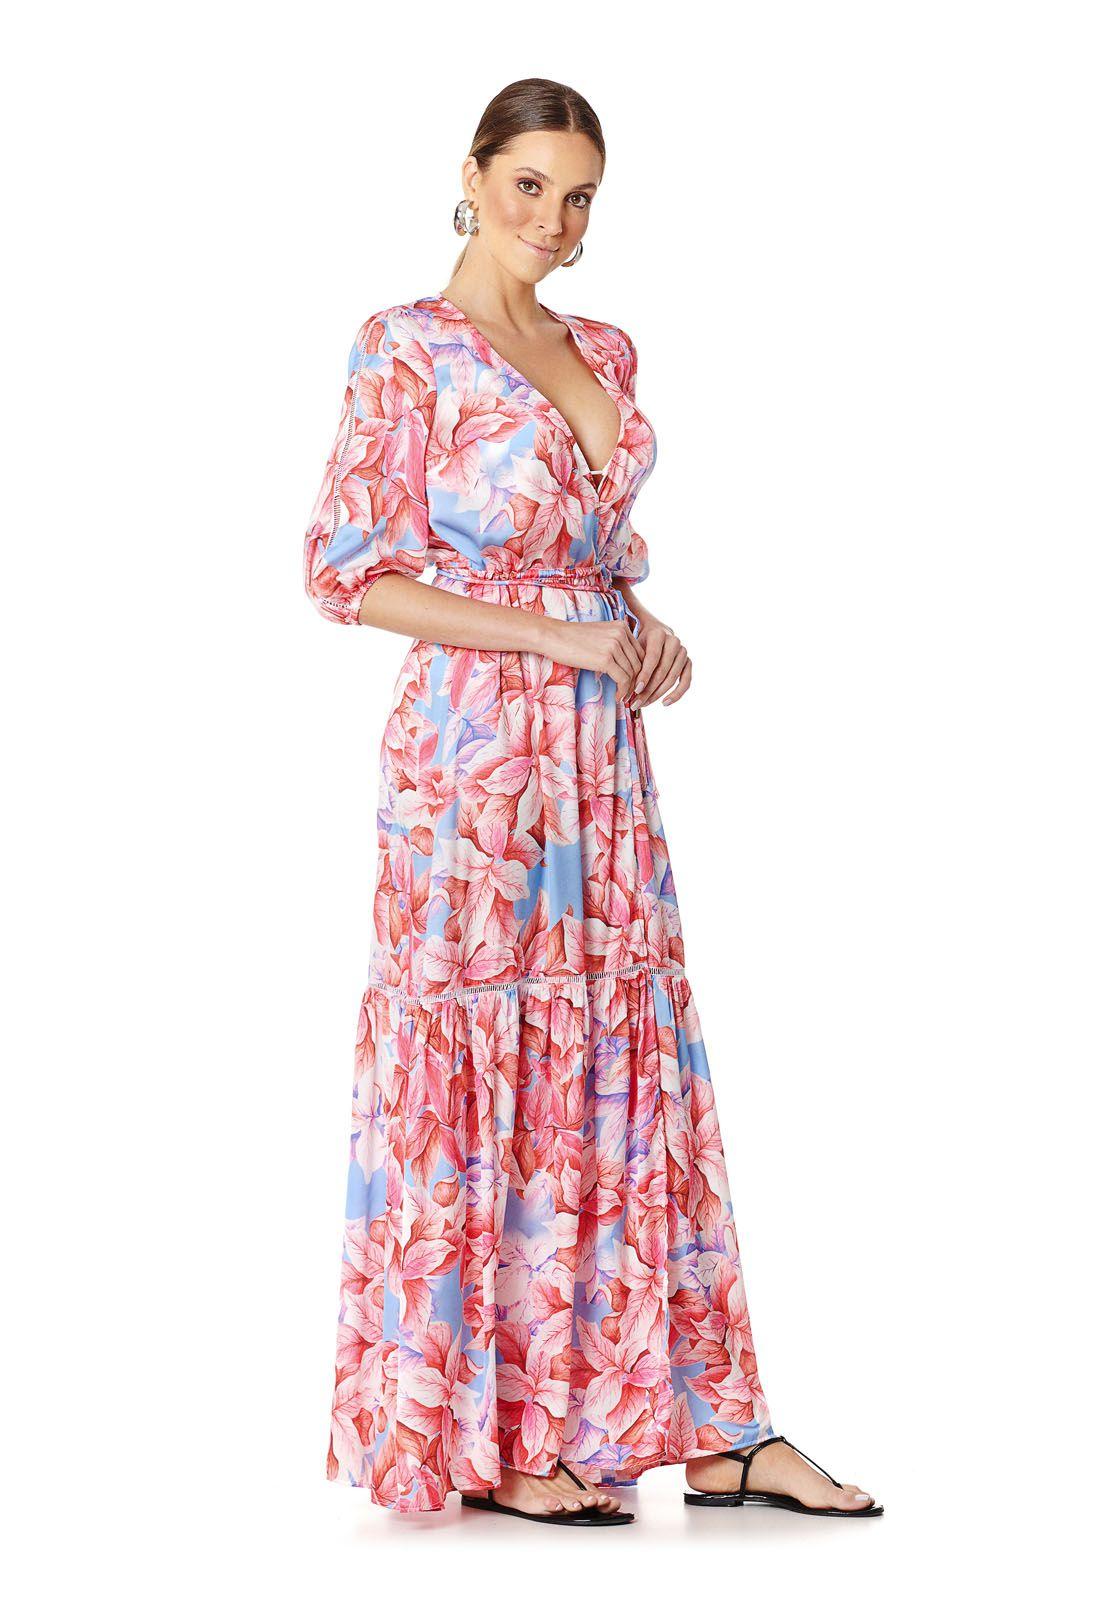 Vestido Pareô Resort Folhagens Rosa Lala Dubi